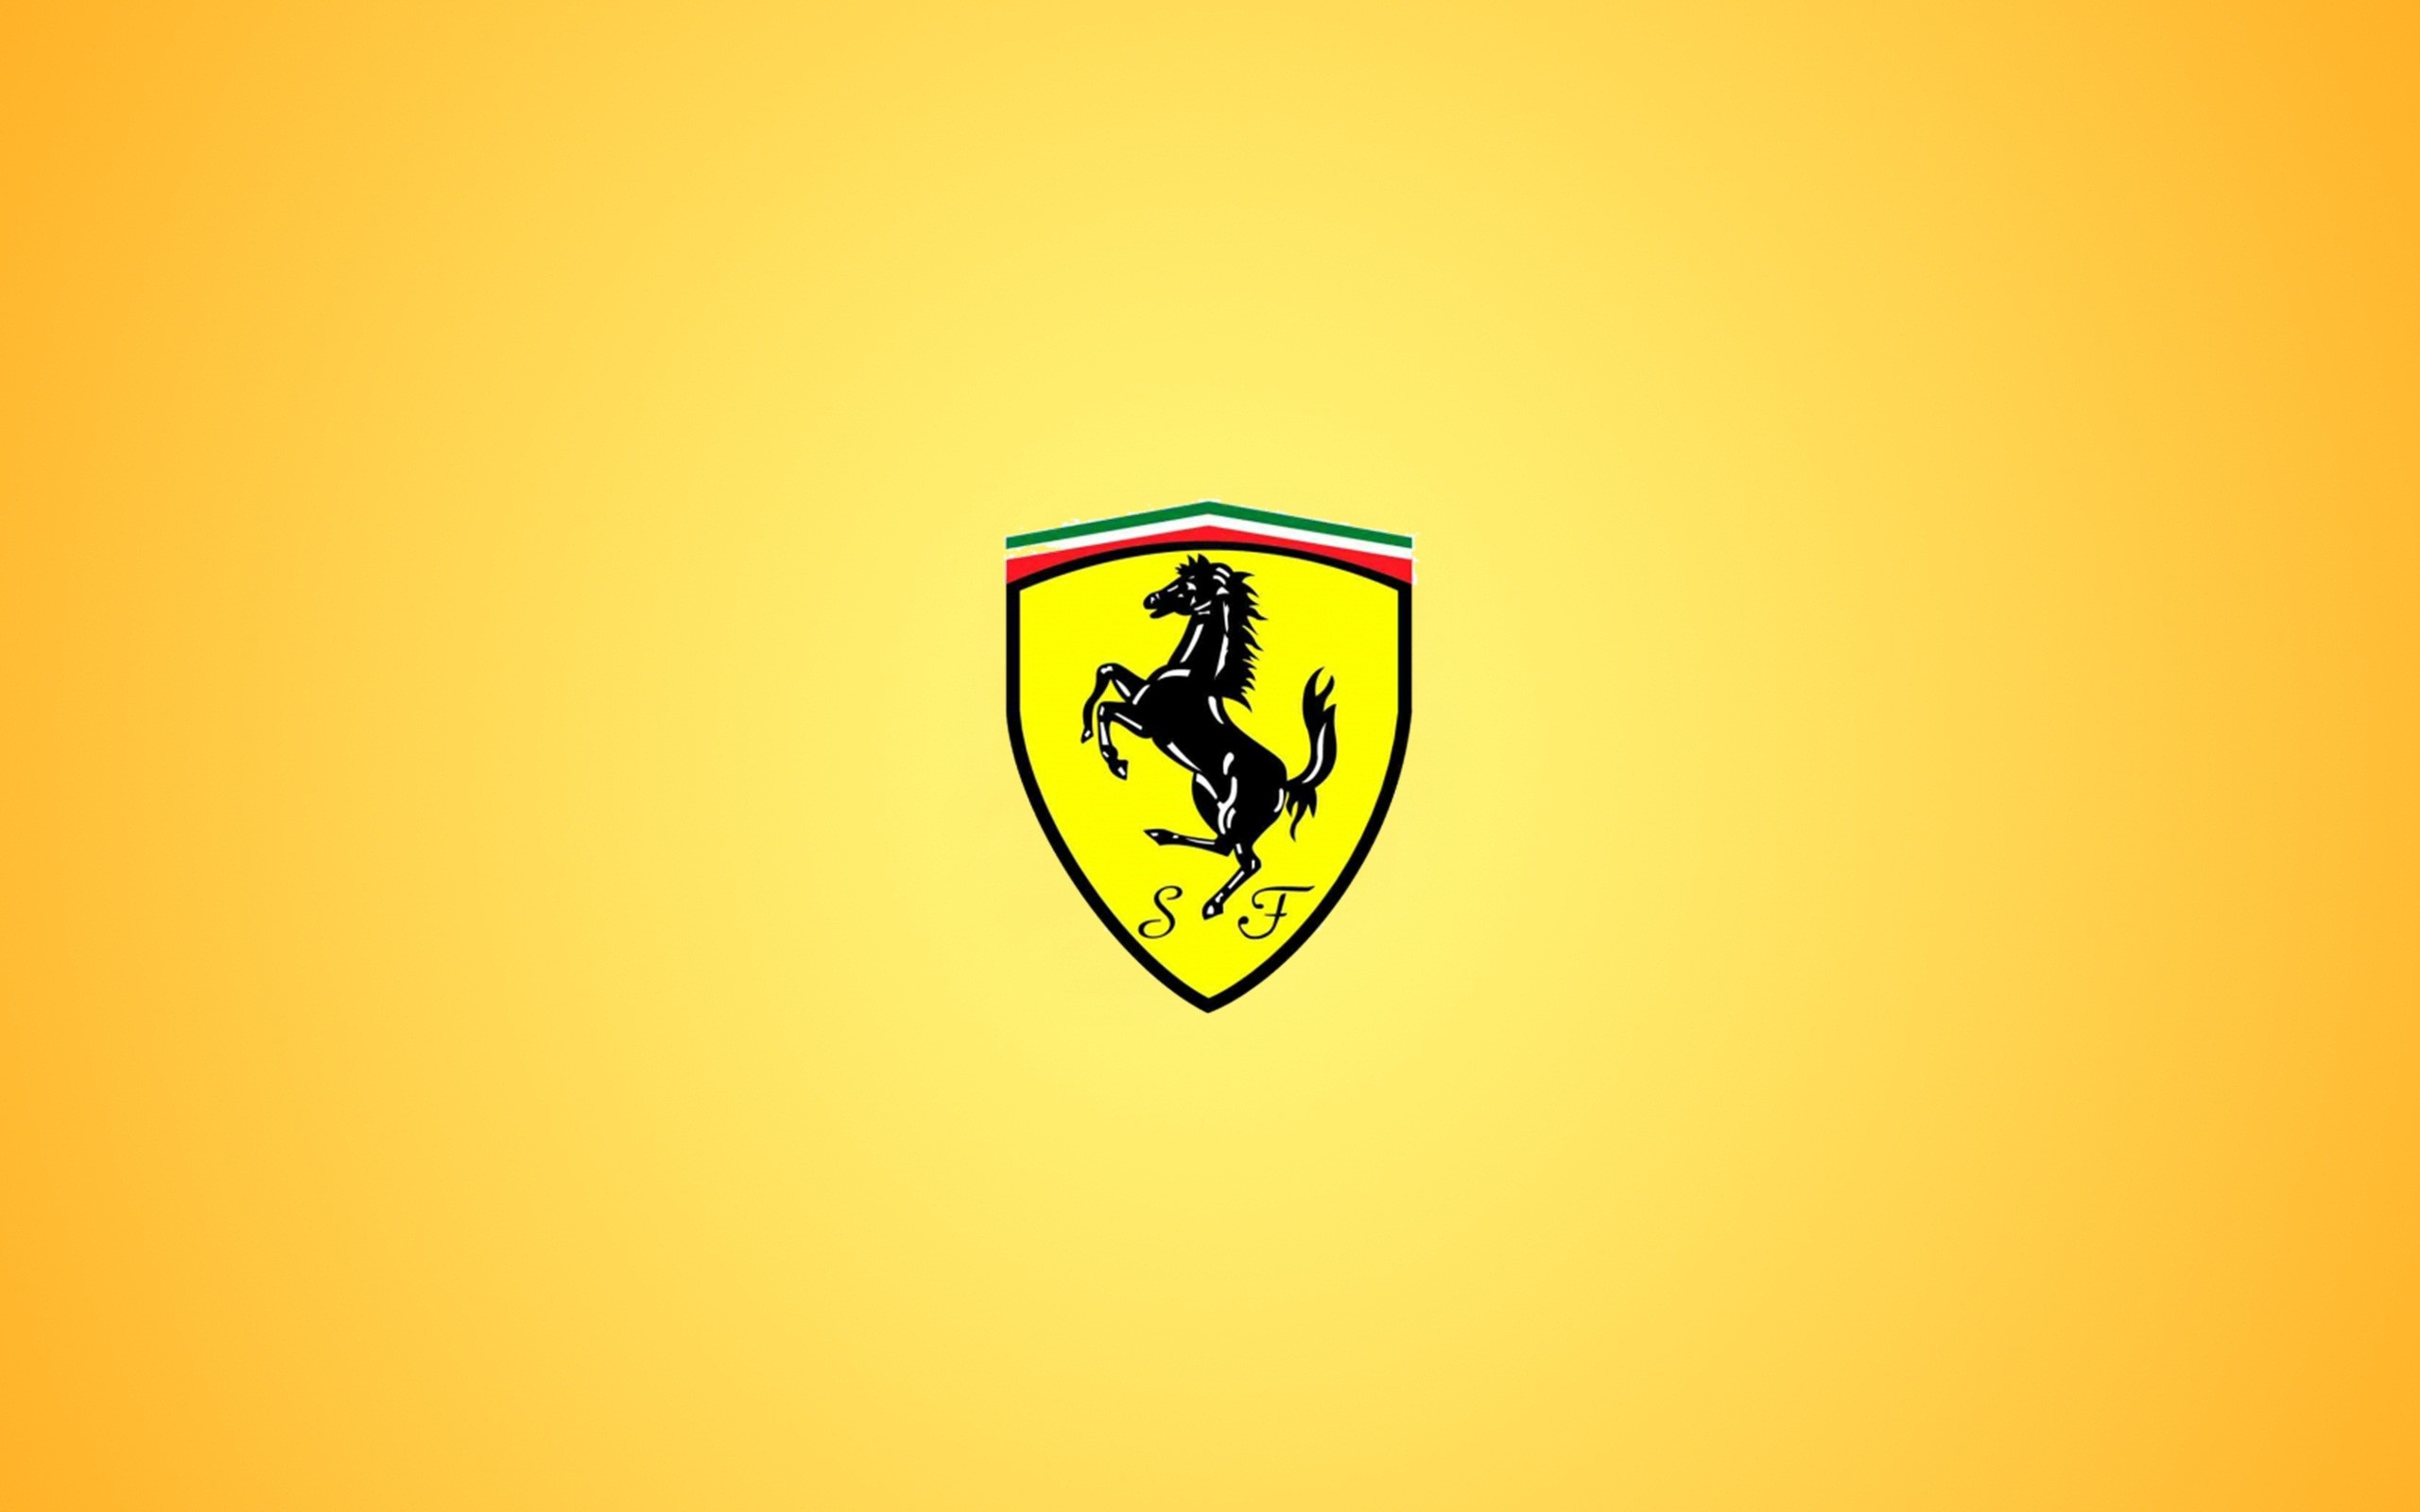 Ferrari Ferrari Logo Wallpaper 2560x1600 Wallpapertip